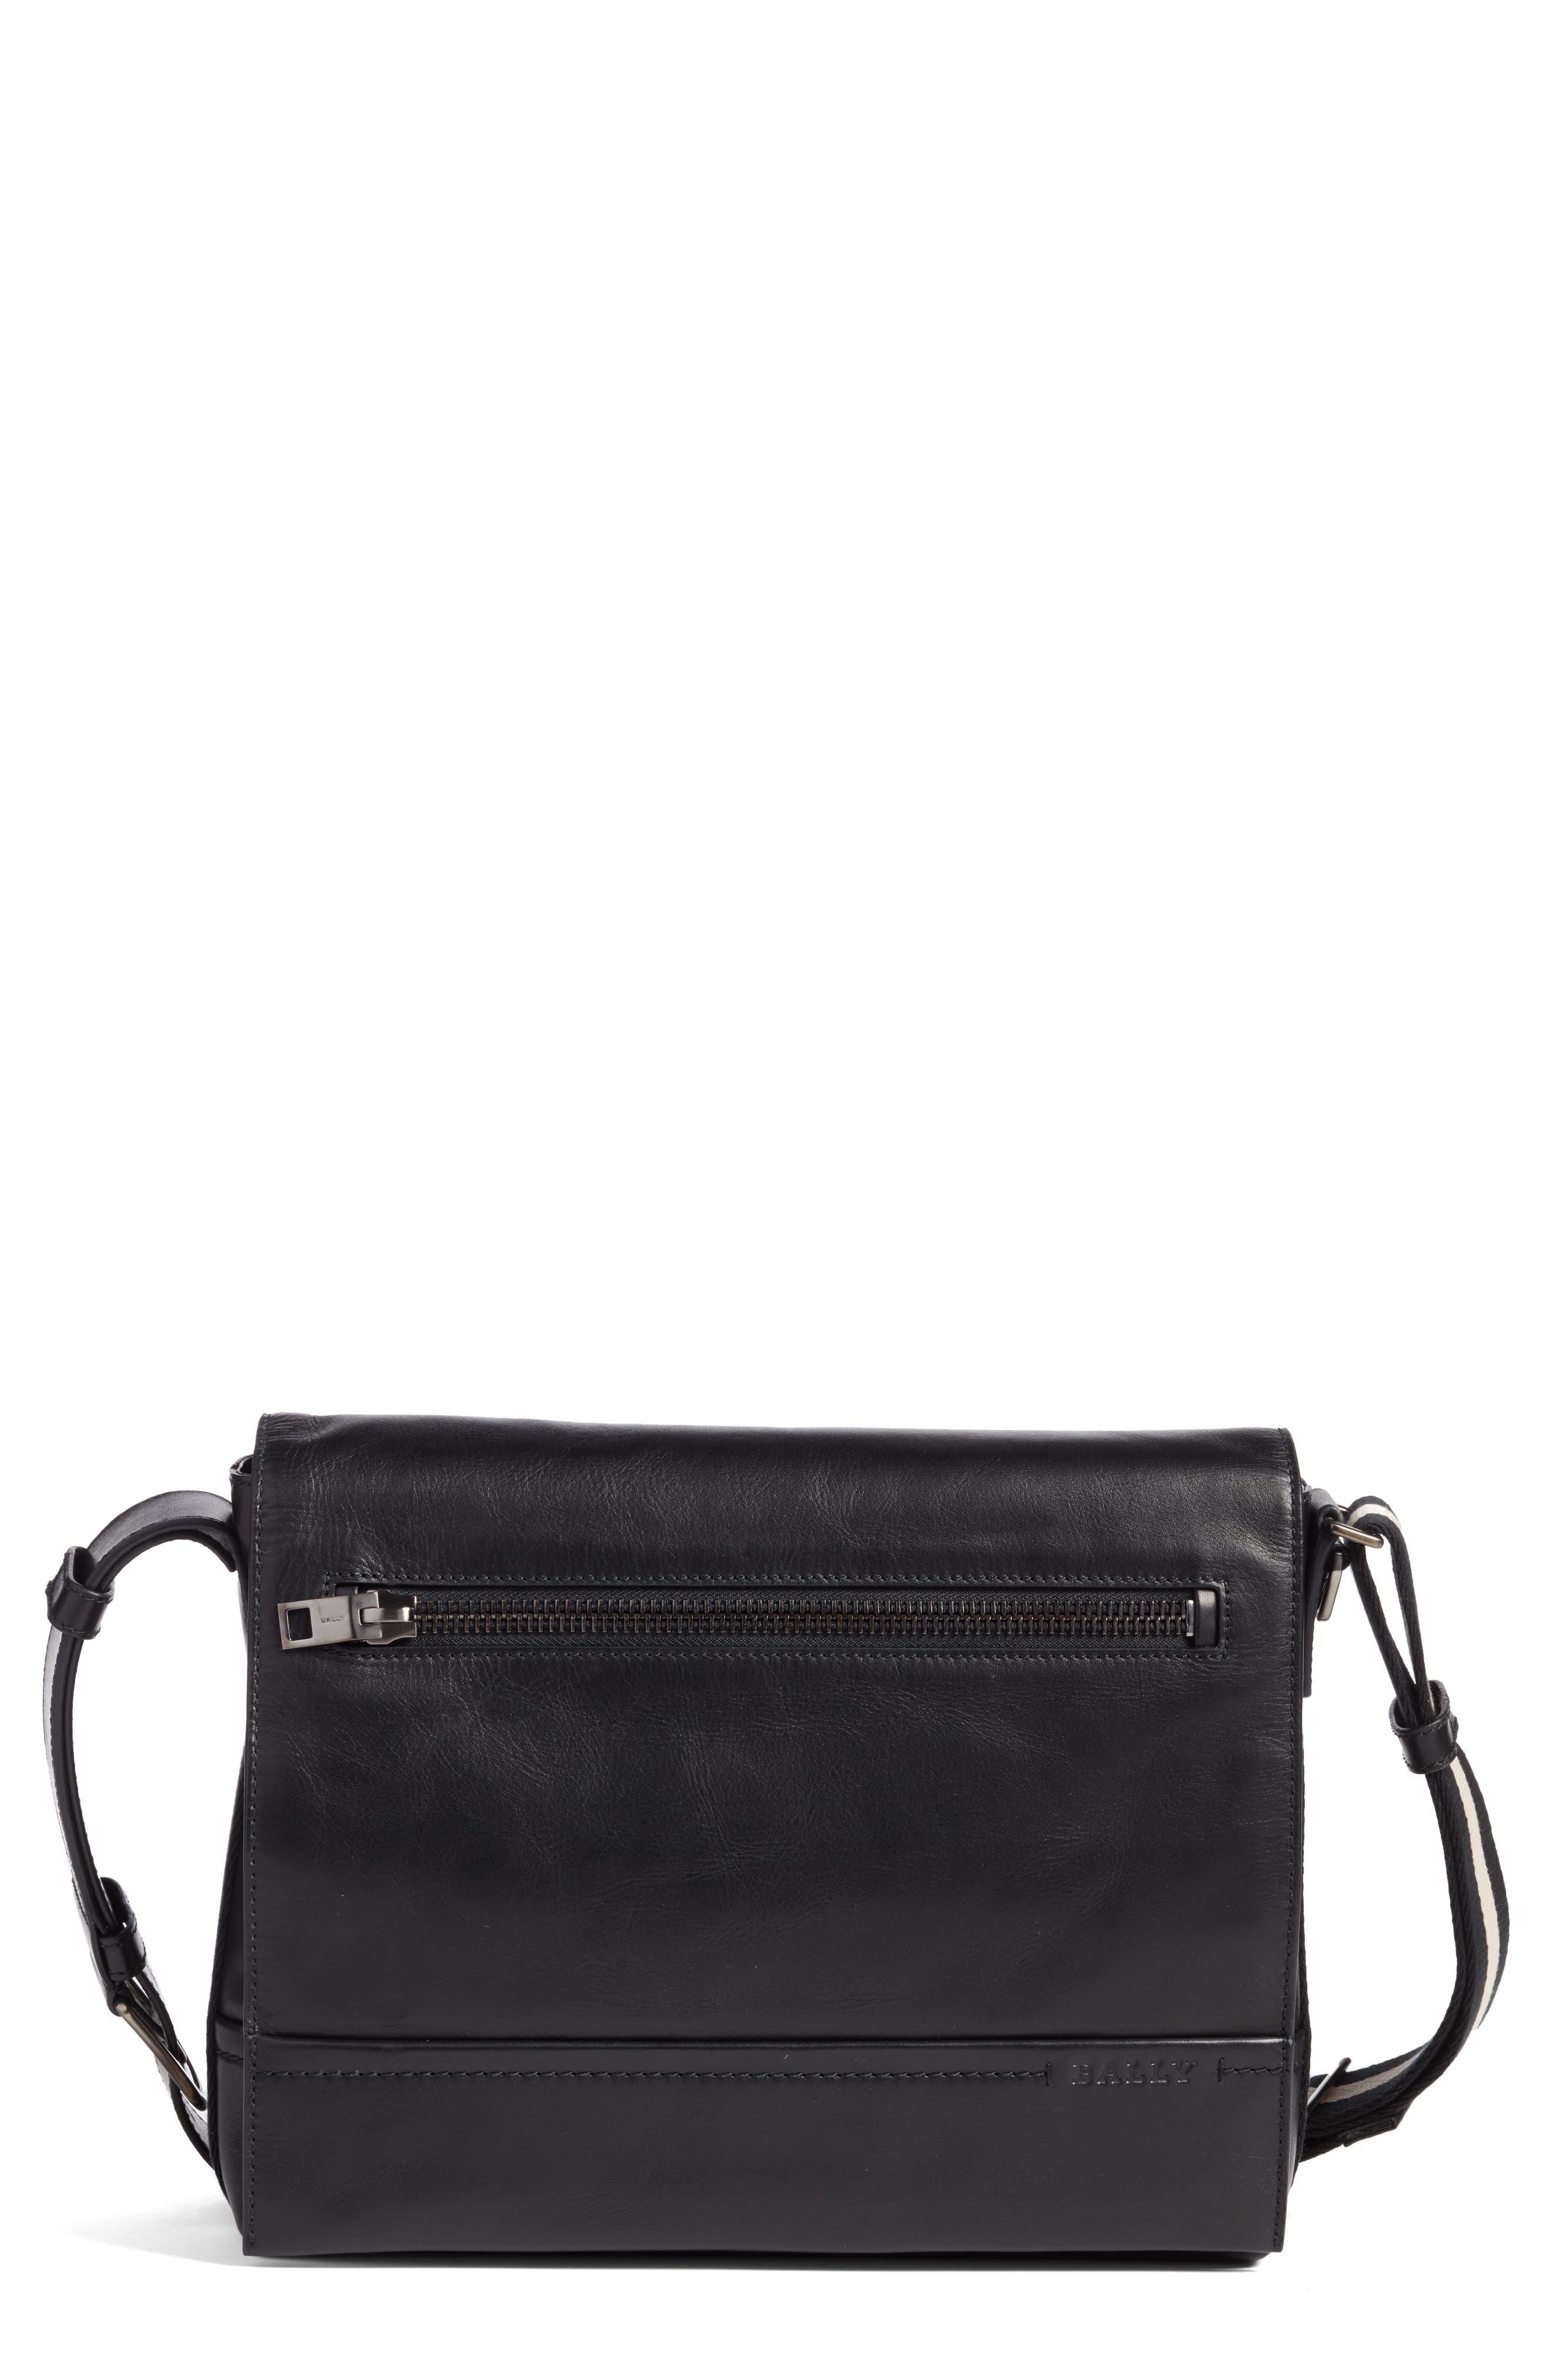 Tamrac Leather Messenger Bag,                         Main,                         color, 001